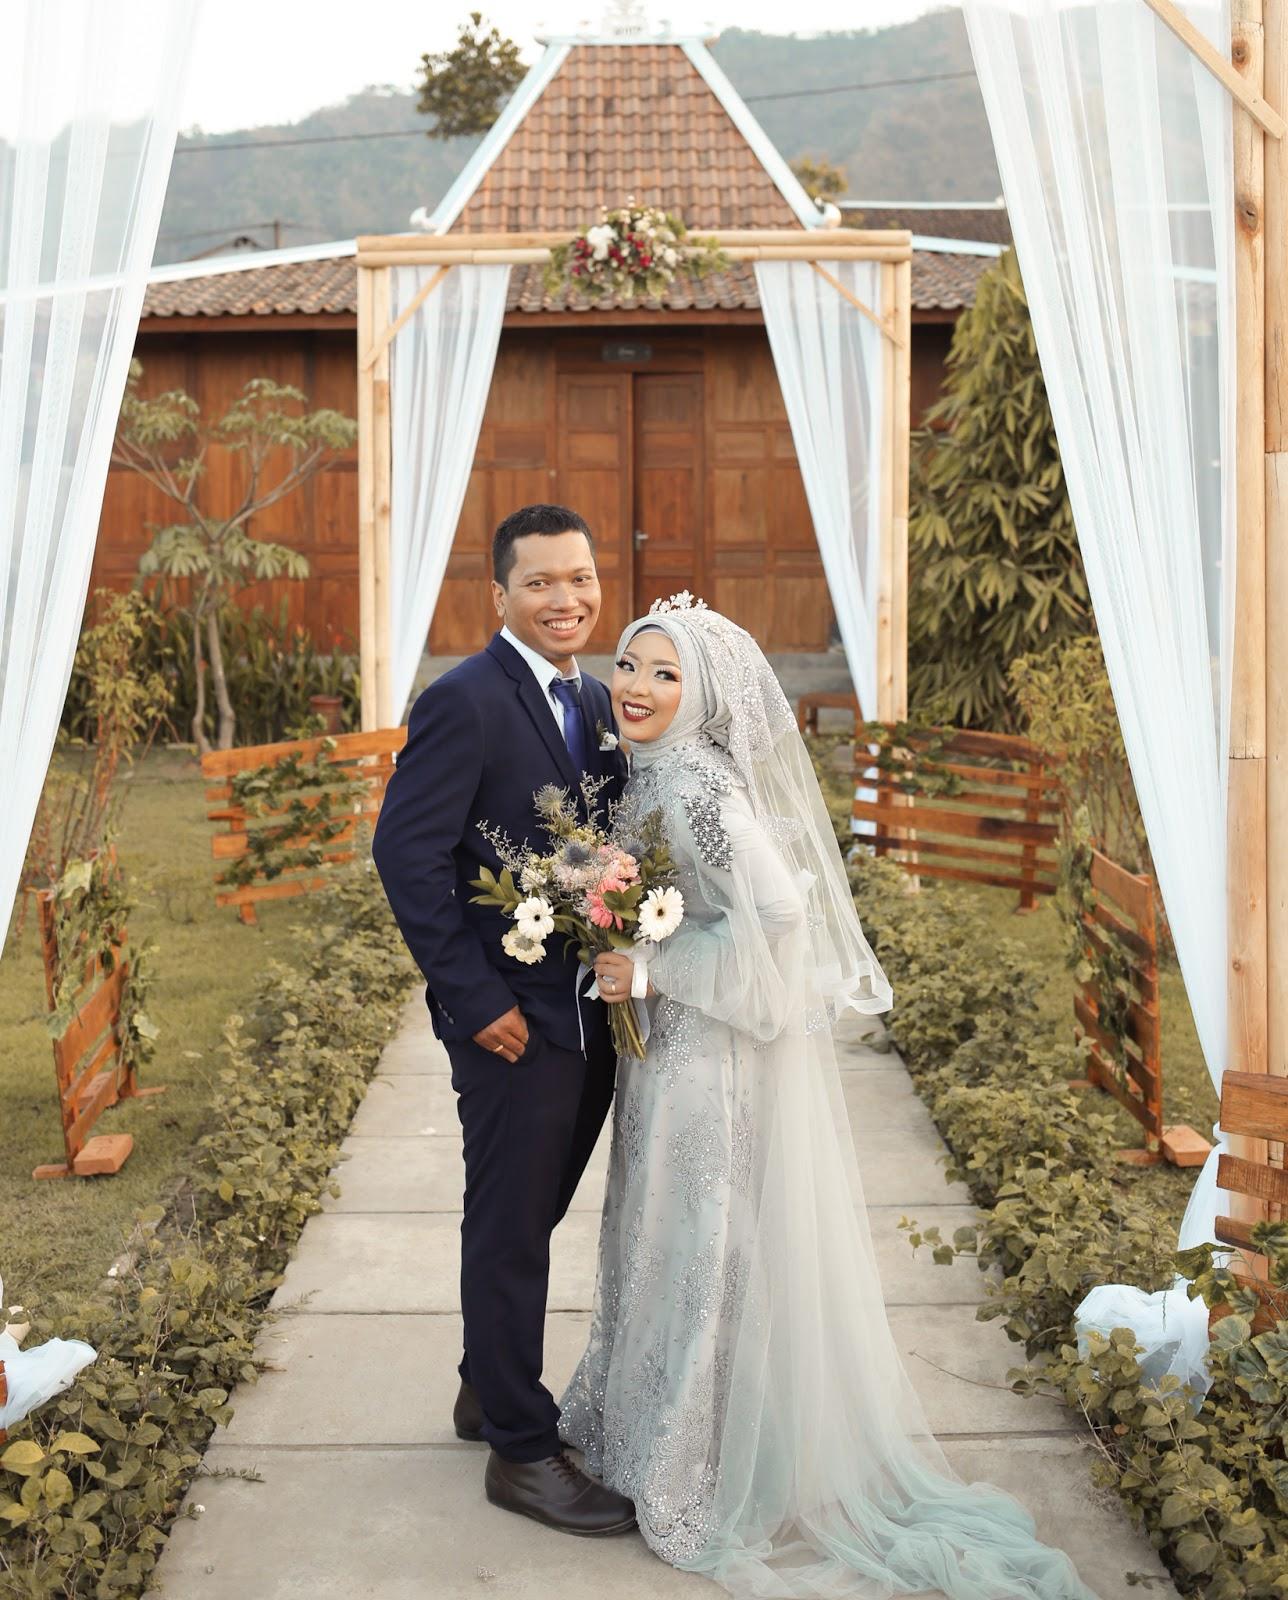 hijab wedding, wedding dress hijab, wedding dress inspiration